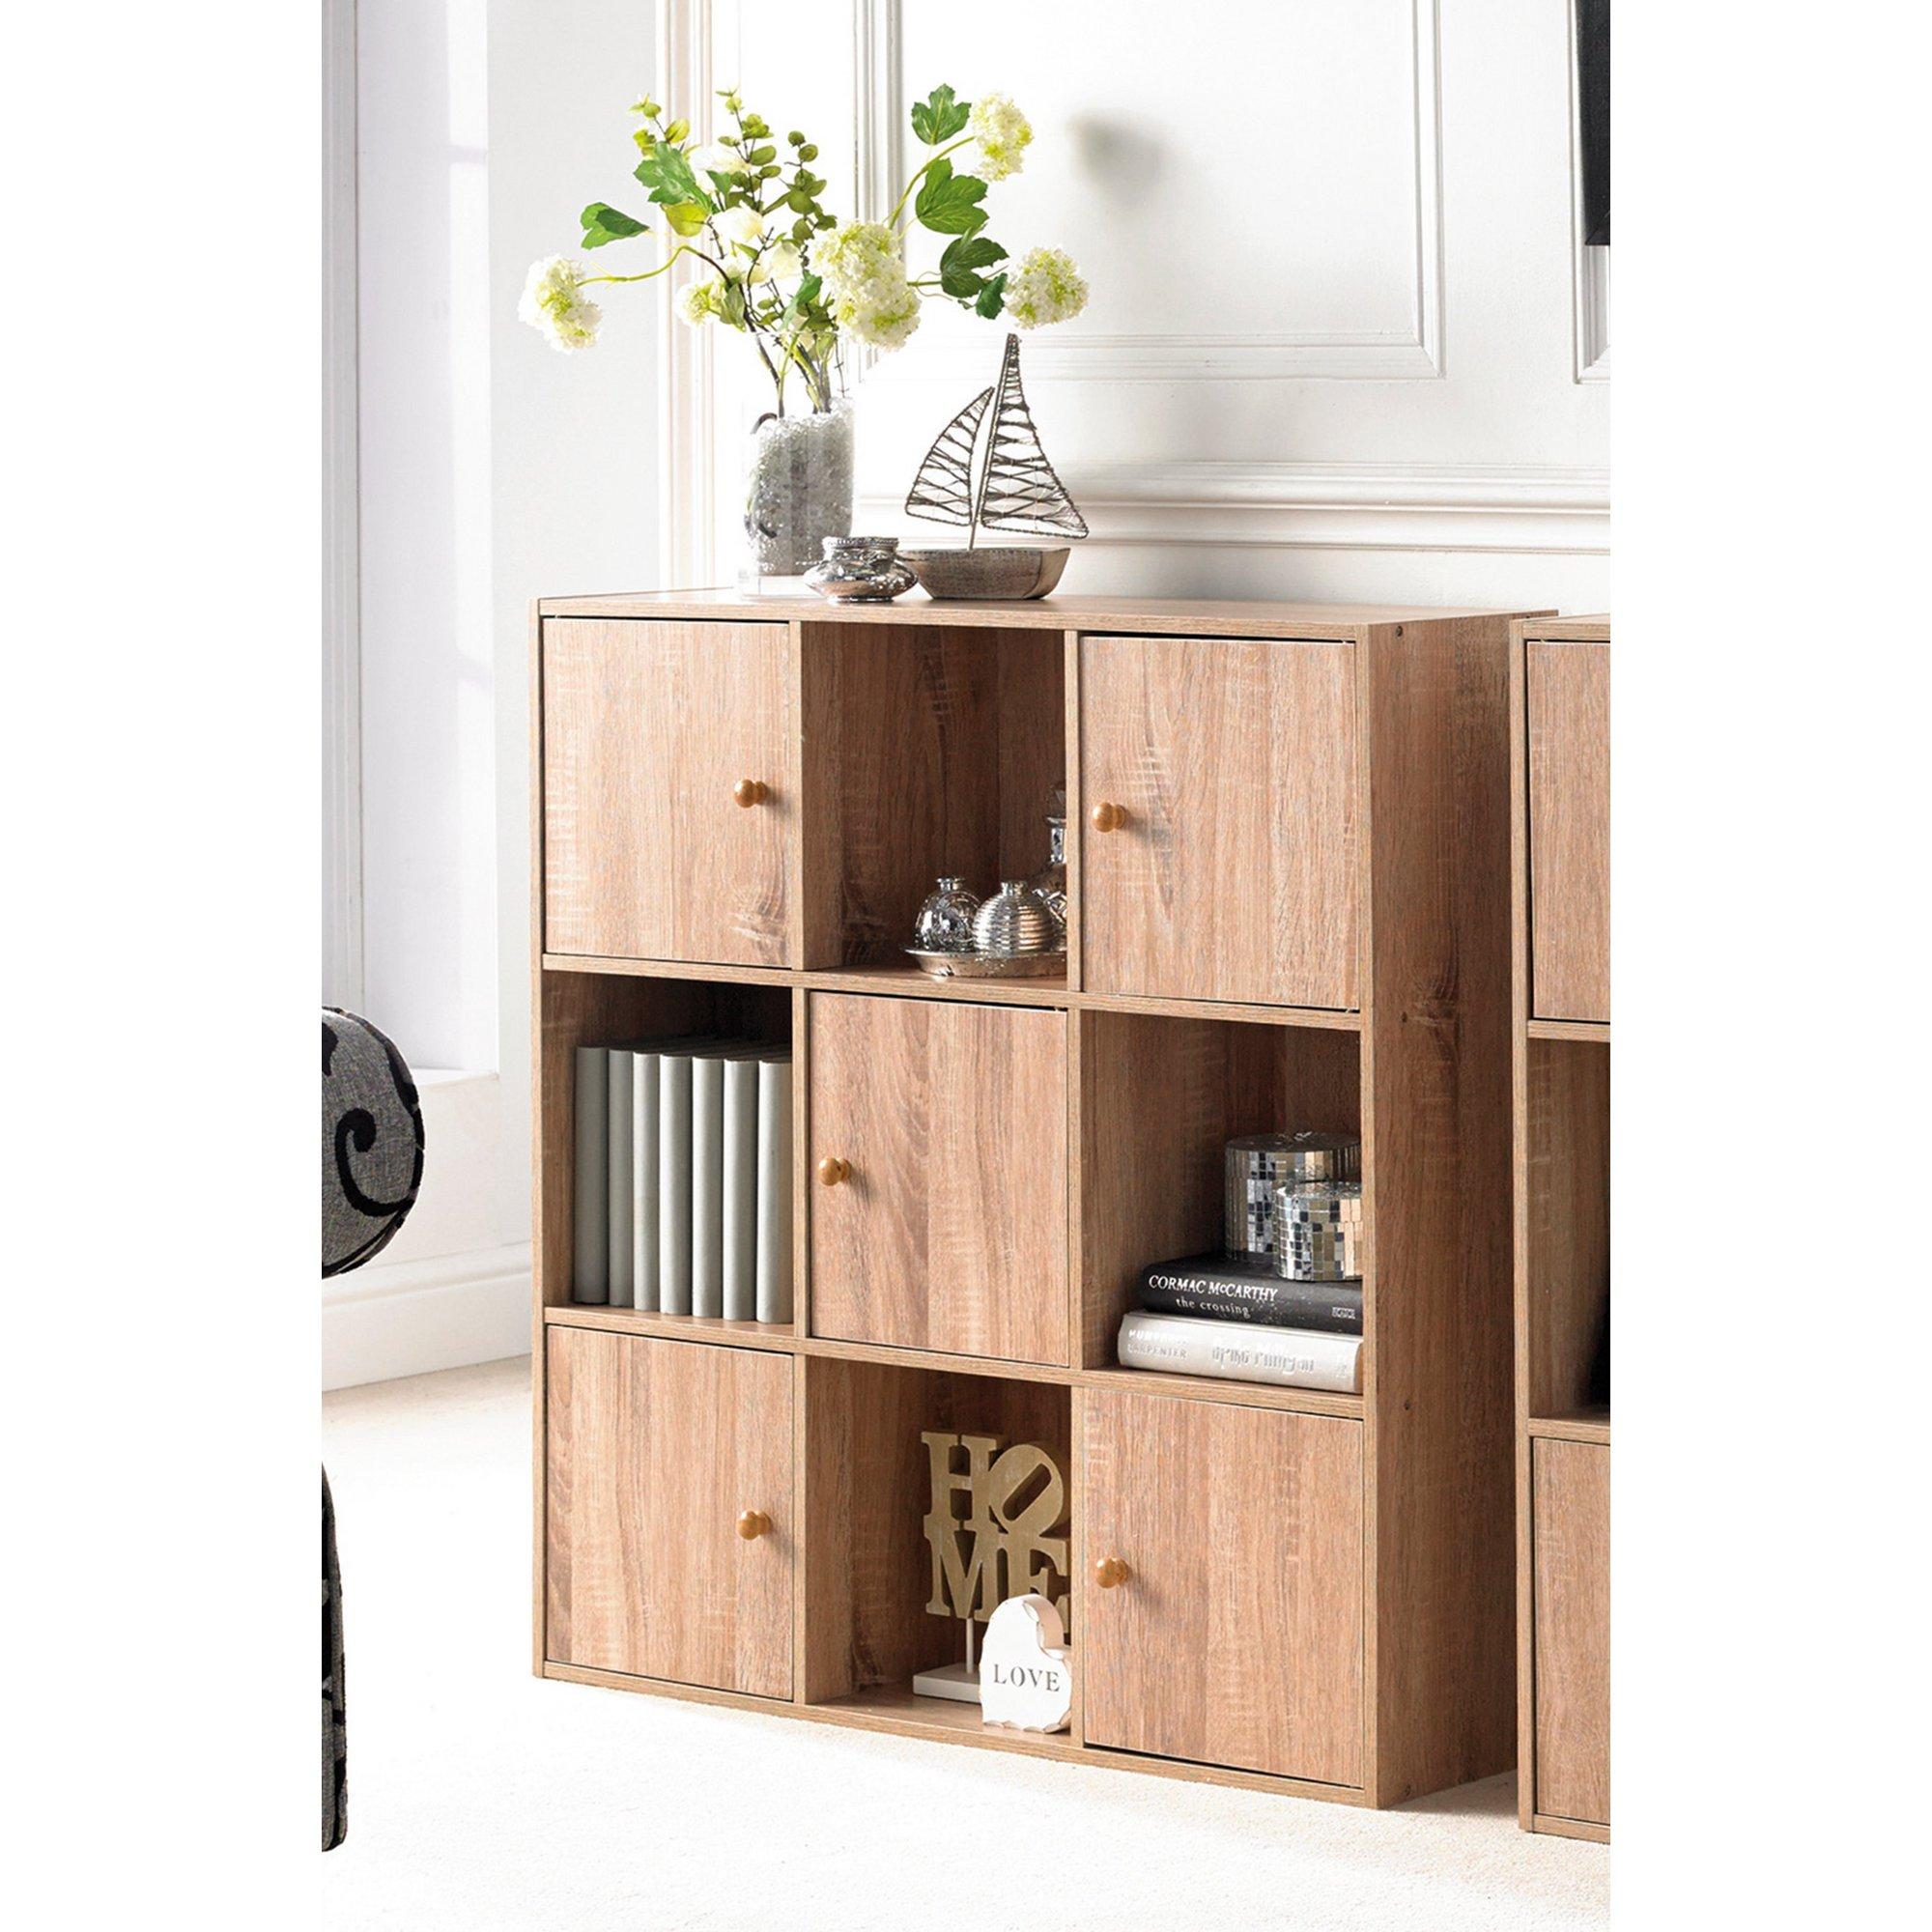 Image of 9 Cube Oak-Effect Storage Unit with Wood Doors